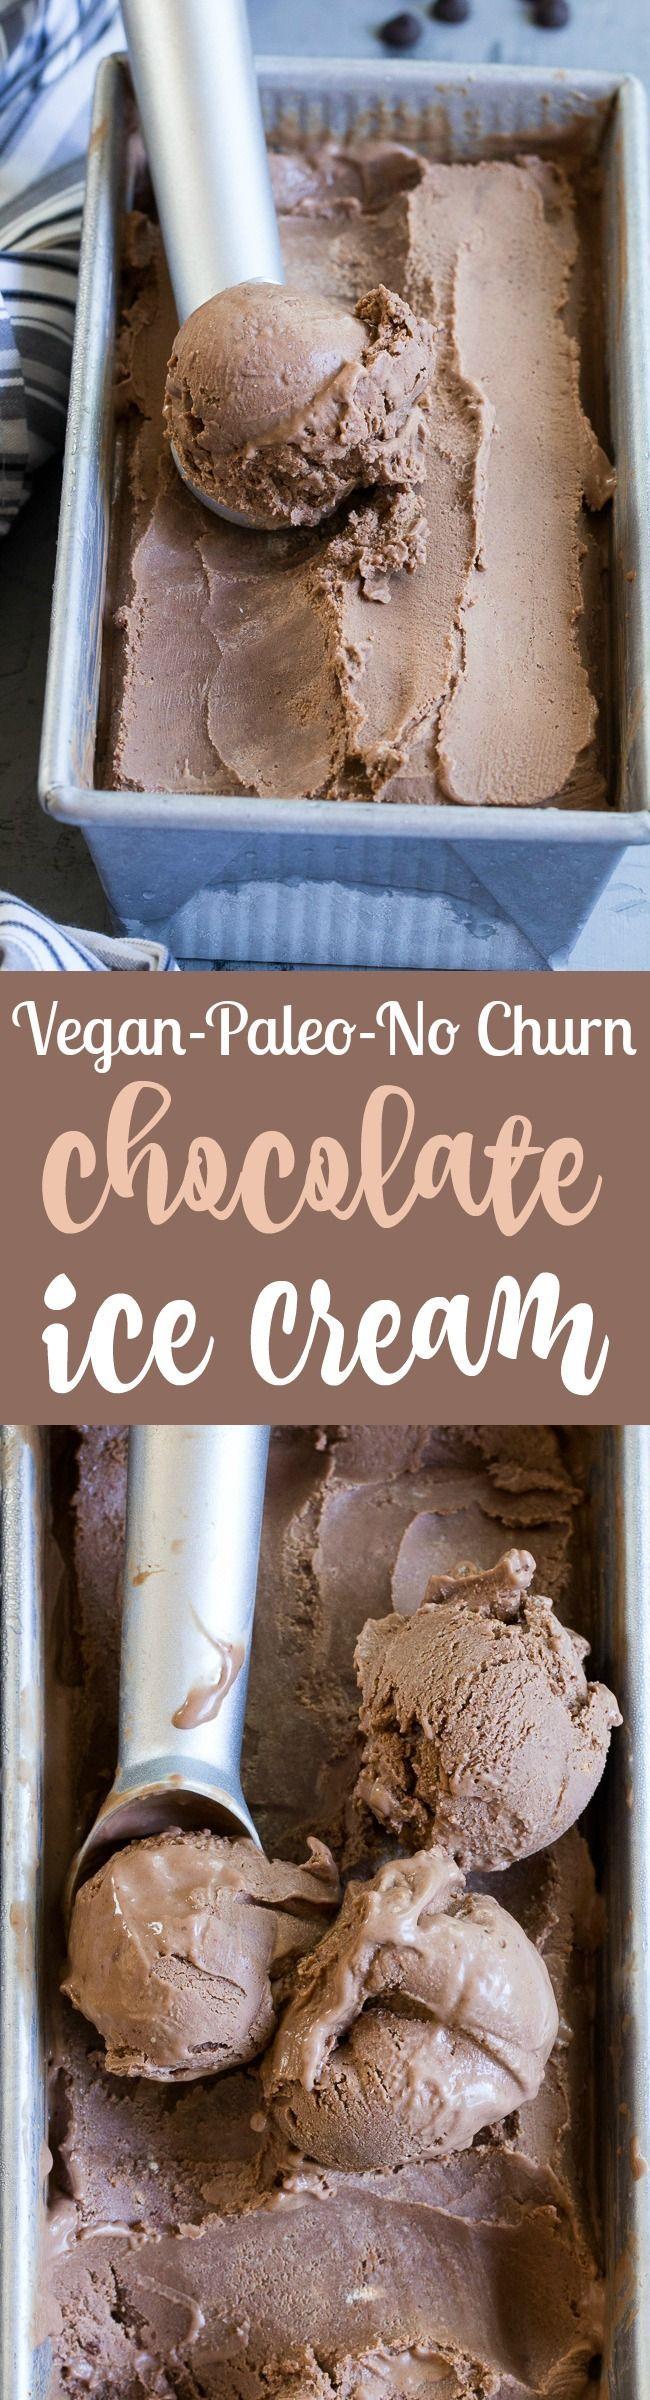 No-Churn Chocolate Coconut Milk Ice Cream {Paleo & Vegan}   #justeatrealfood #paleorunningmomma